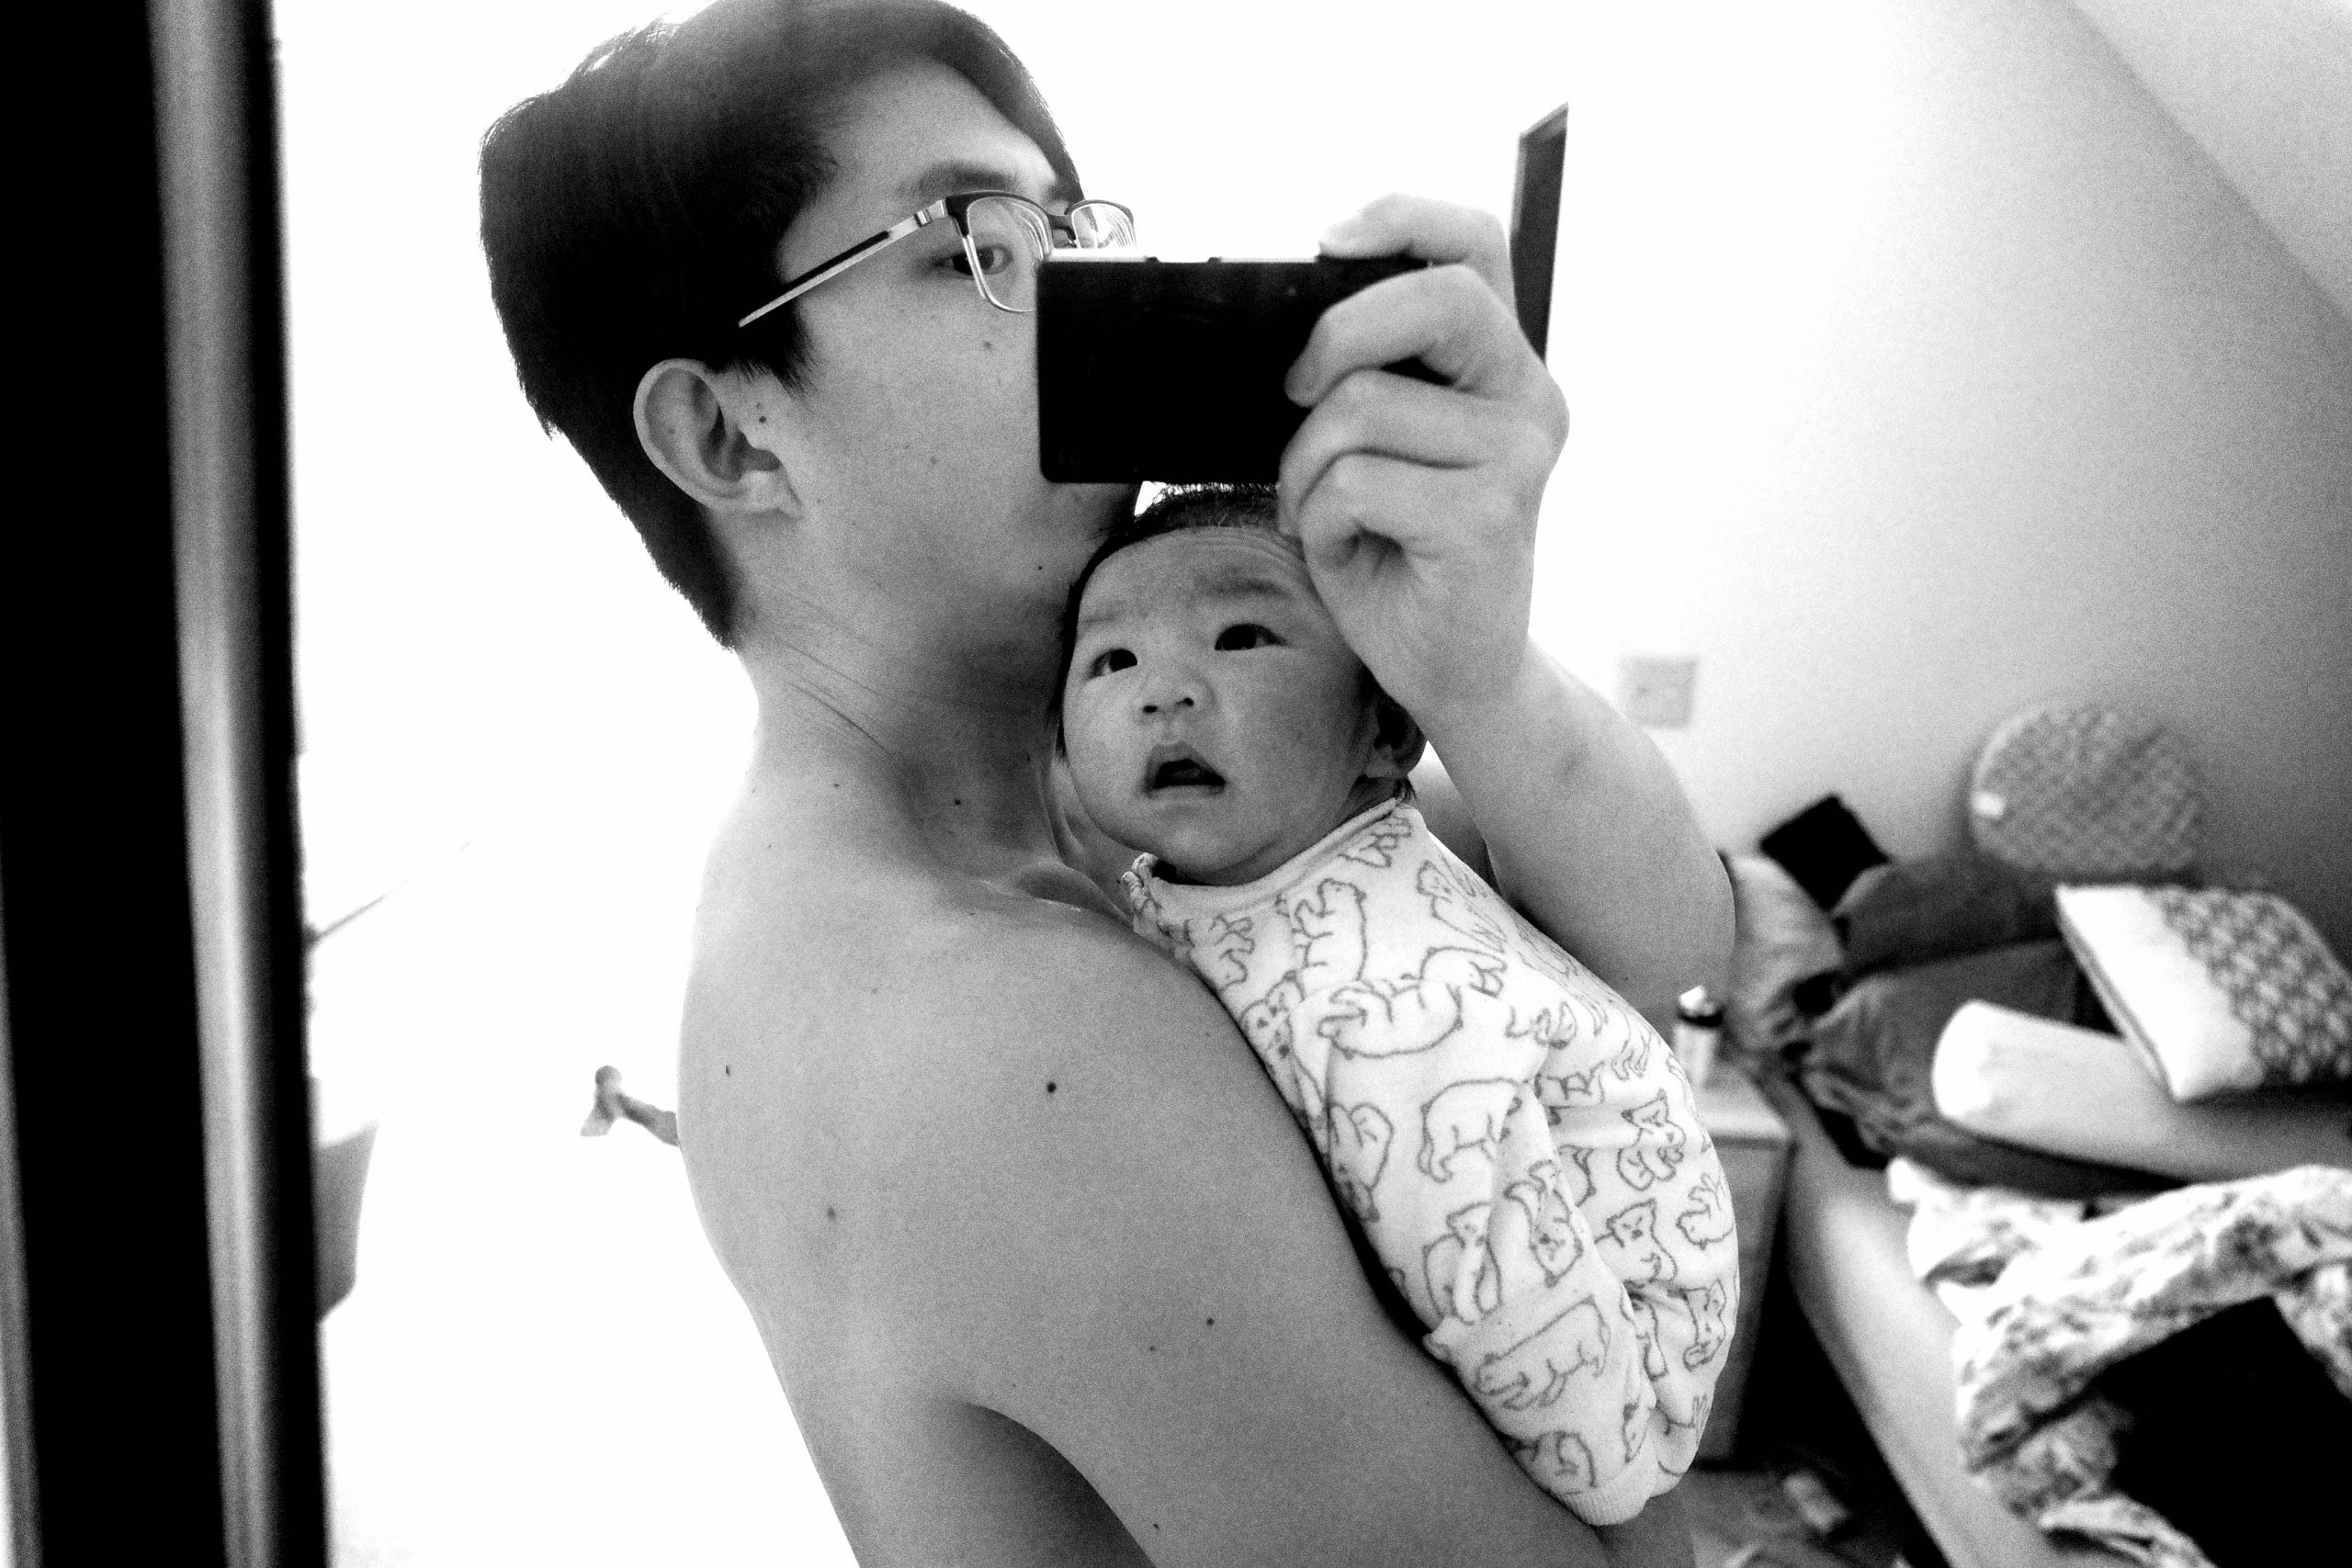 seneca and daddy